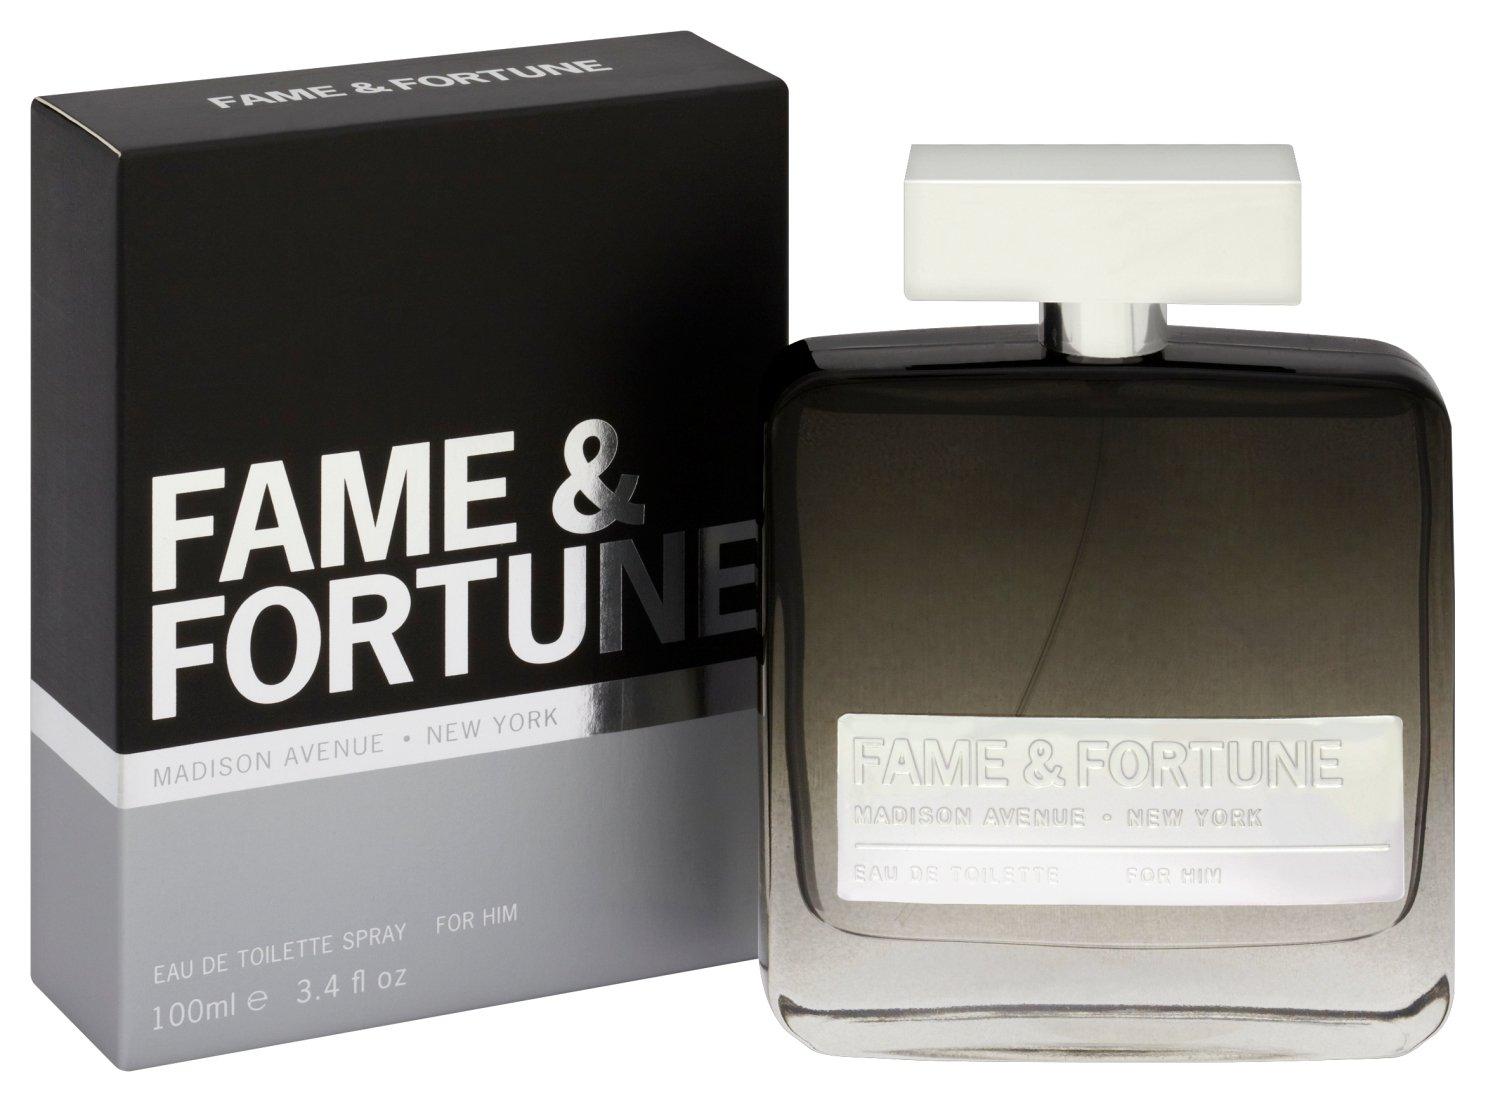 Fame and Fortune Eau de Toilette Spray for Men - 100ml